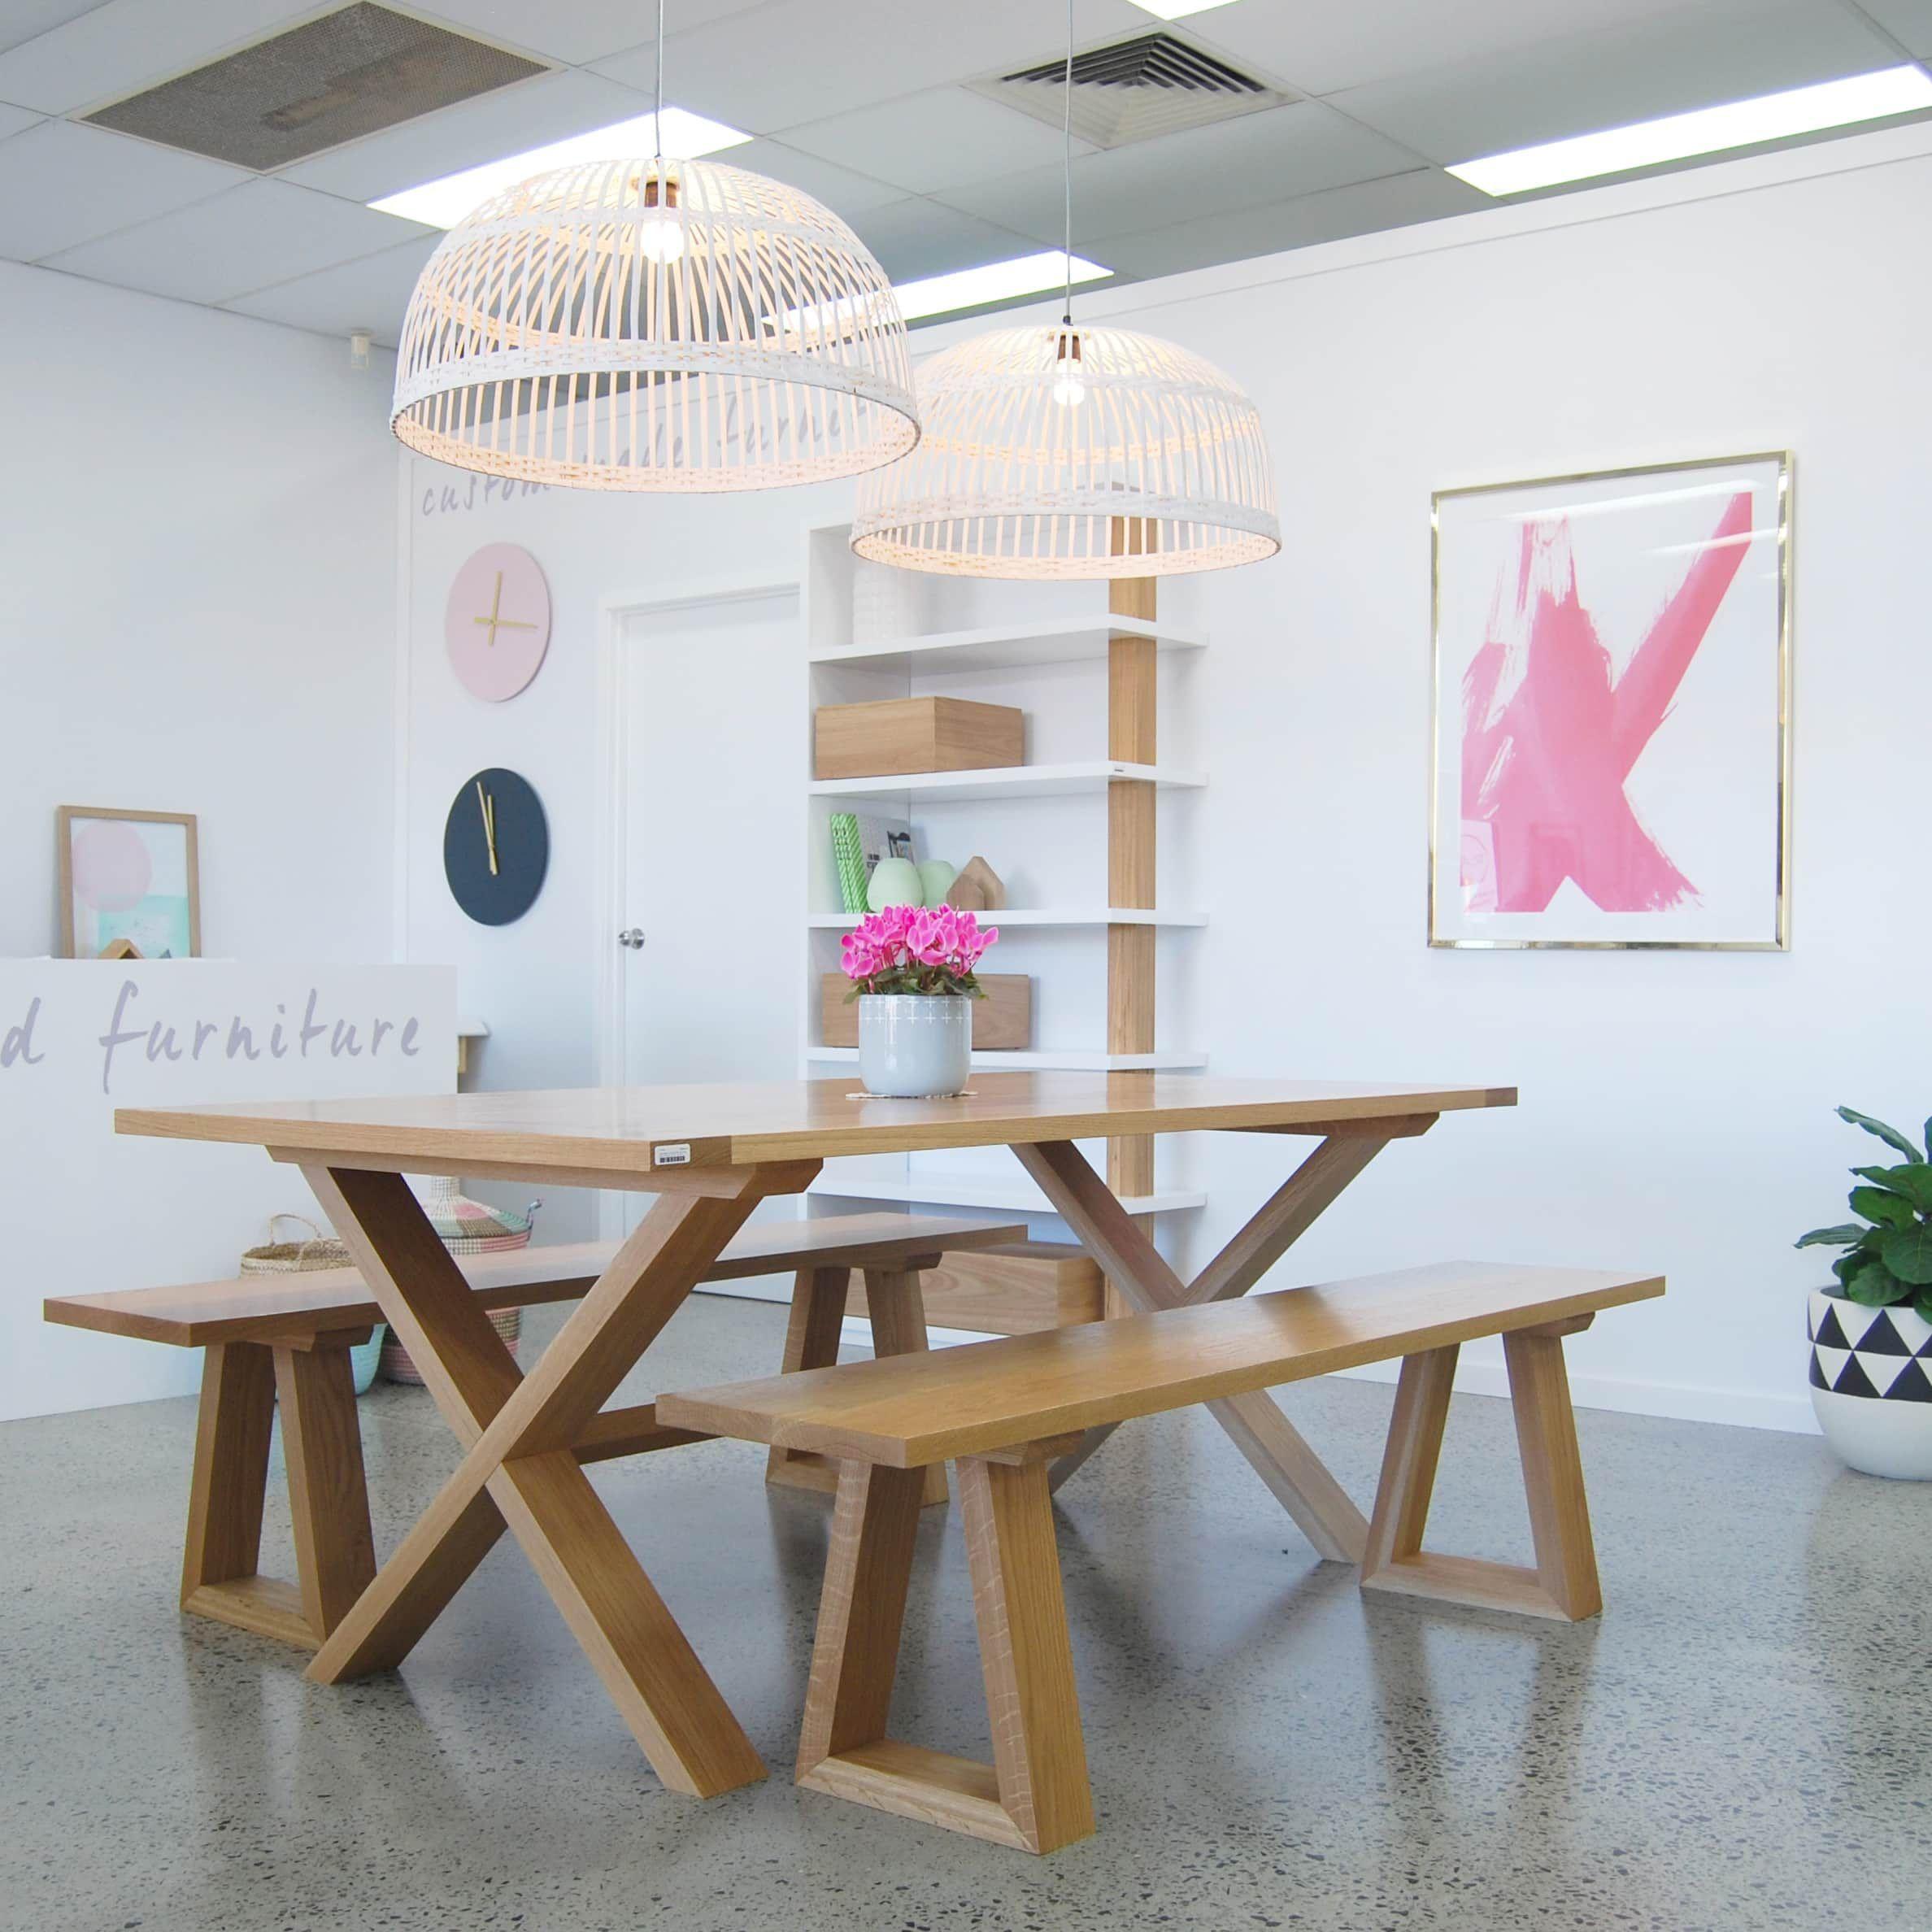 Mooloolaba Dining Table Furniture Furniture Timber Dining